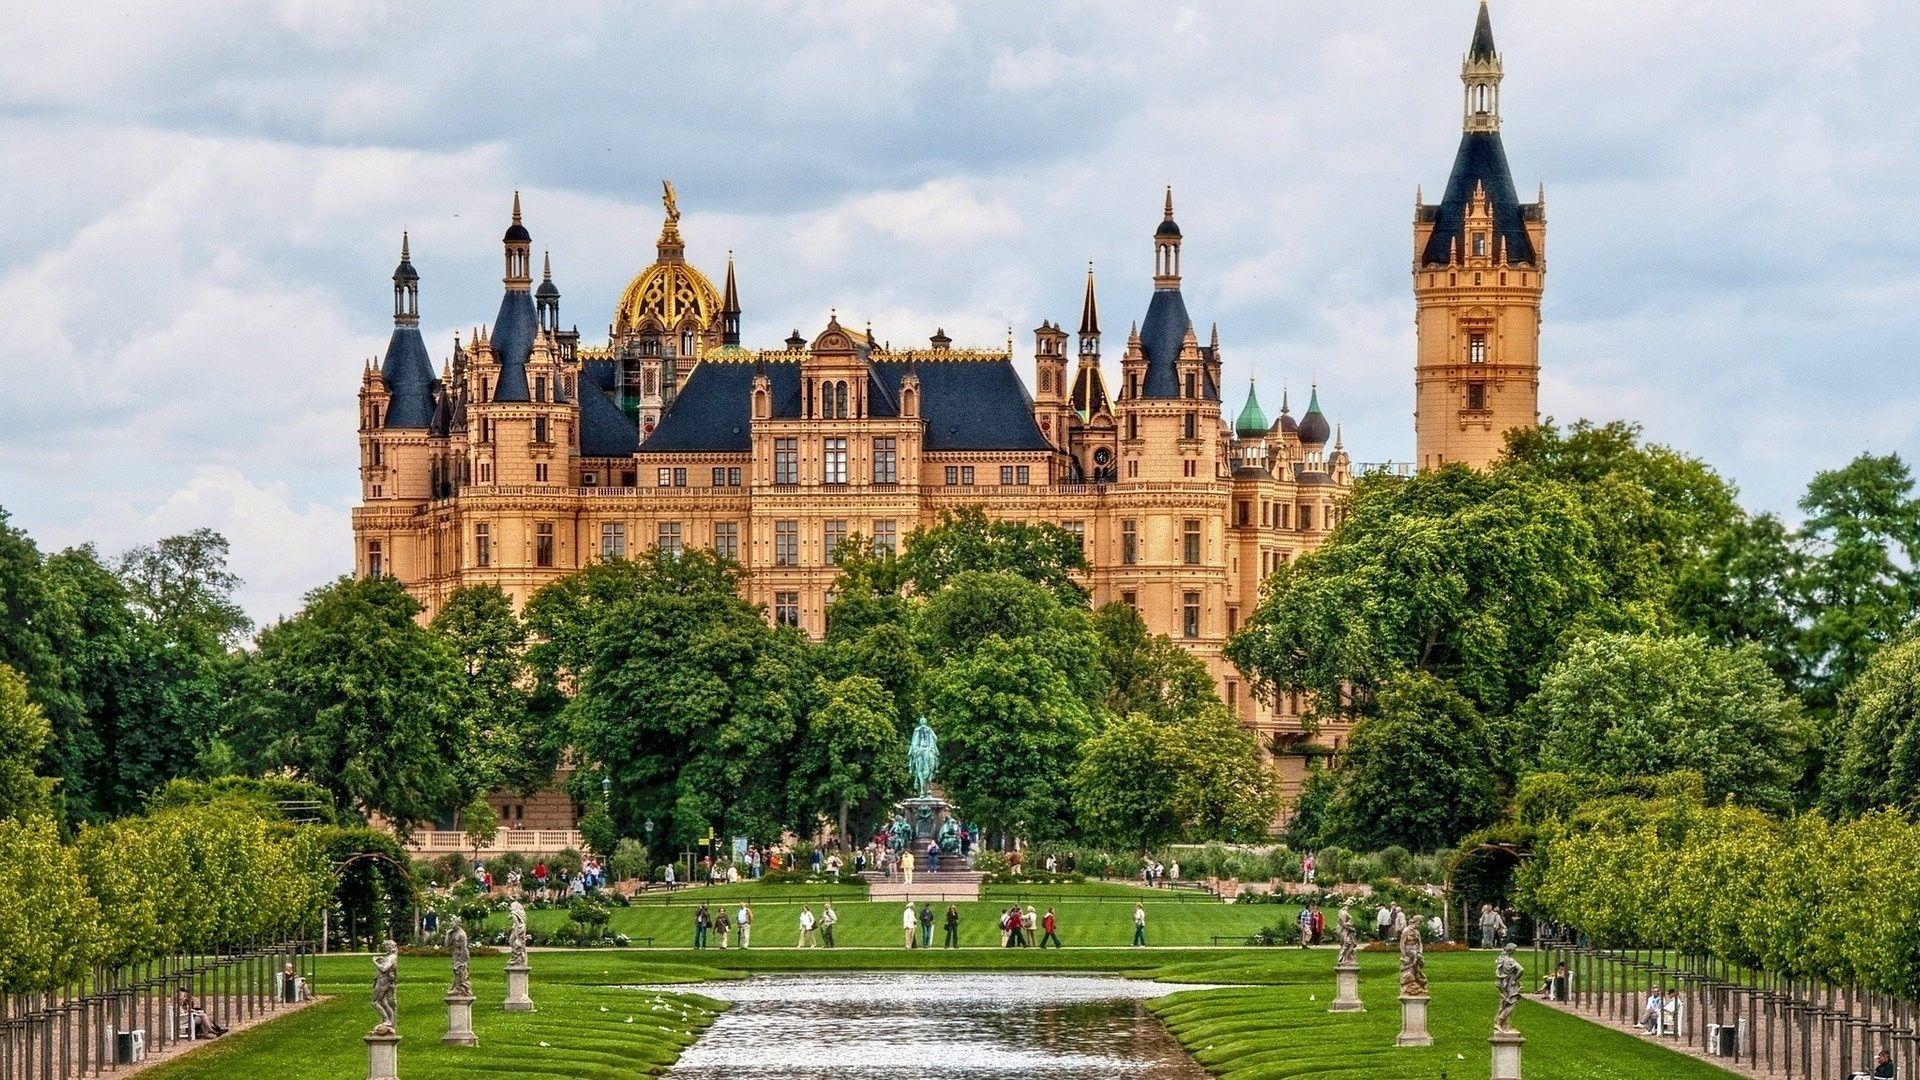 Schwerin Castle Germany Castles Travel 1080p Wallpaper Germany Castles Castles To Visit Beautiful Castles